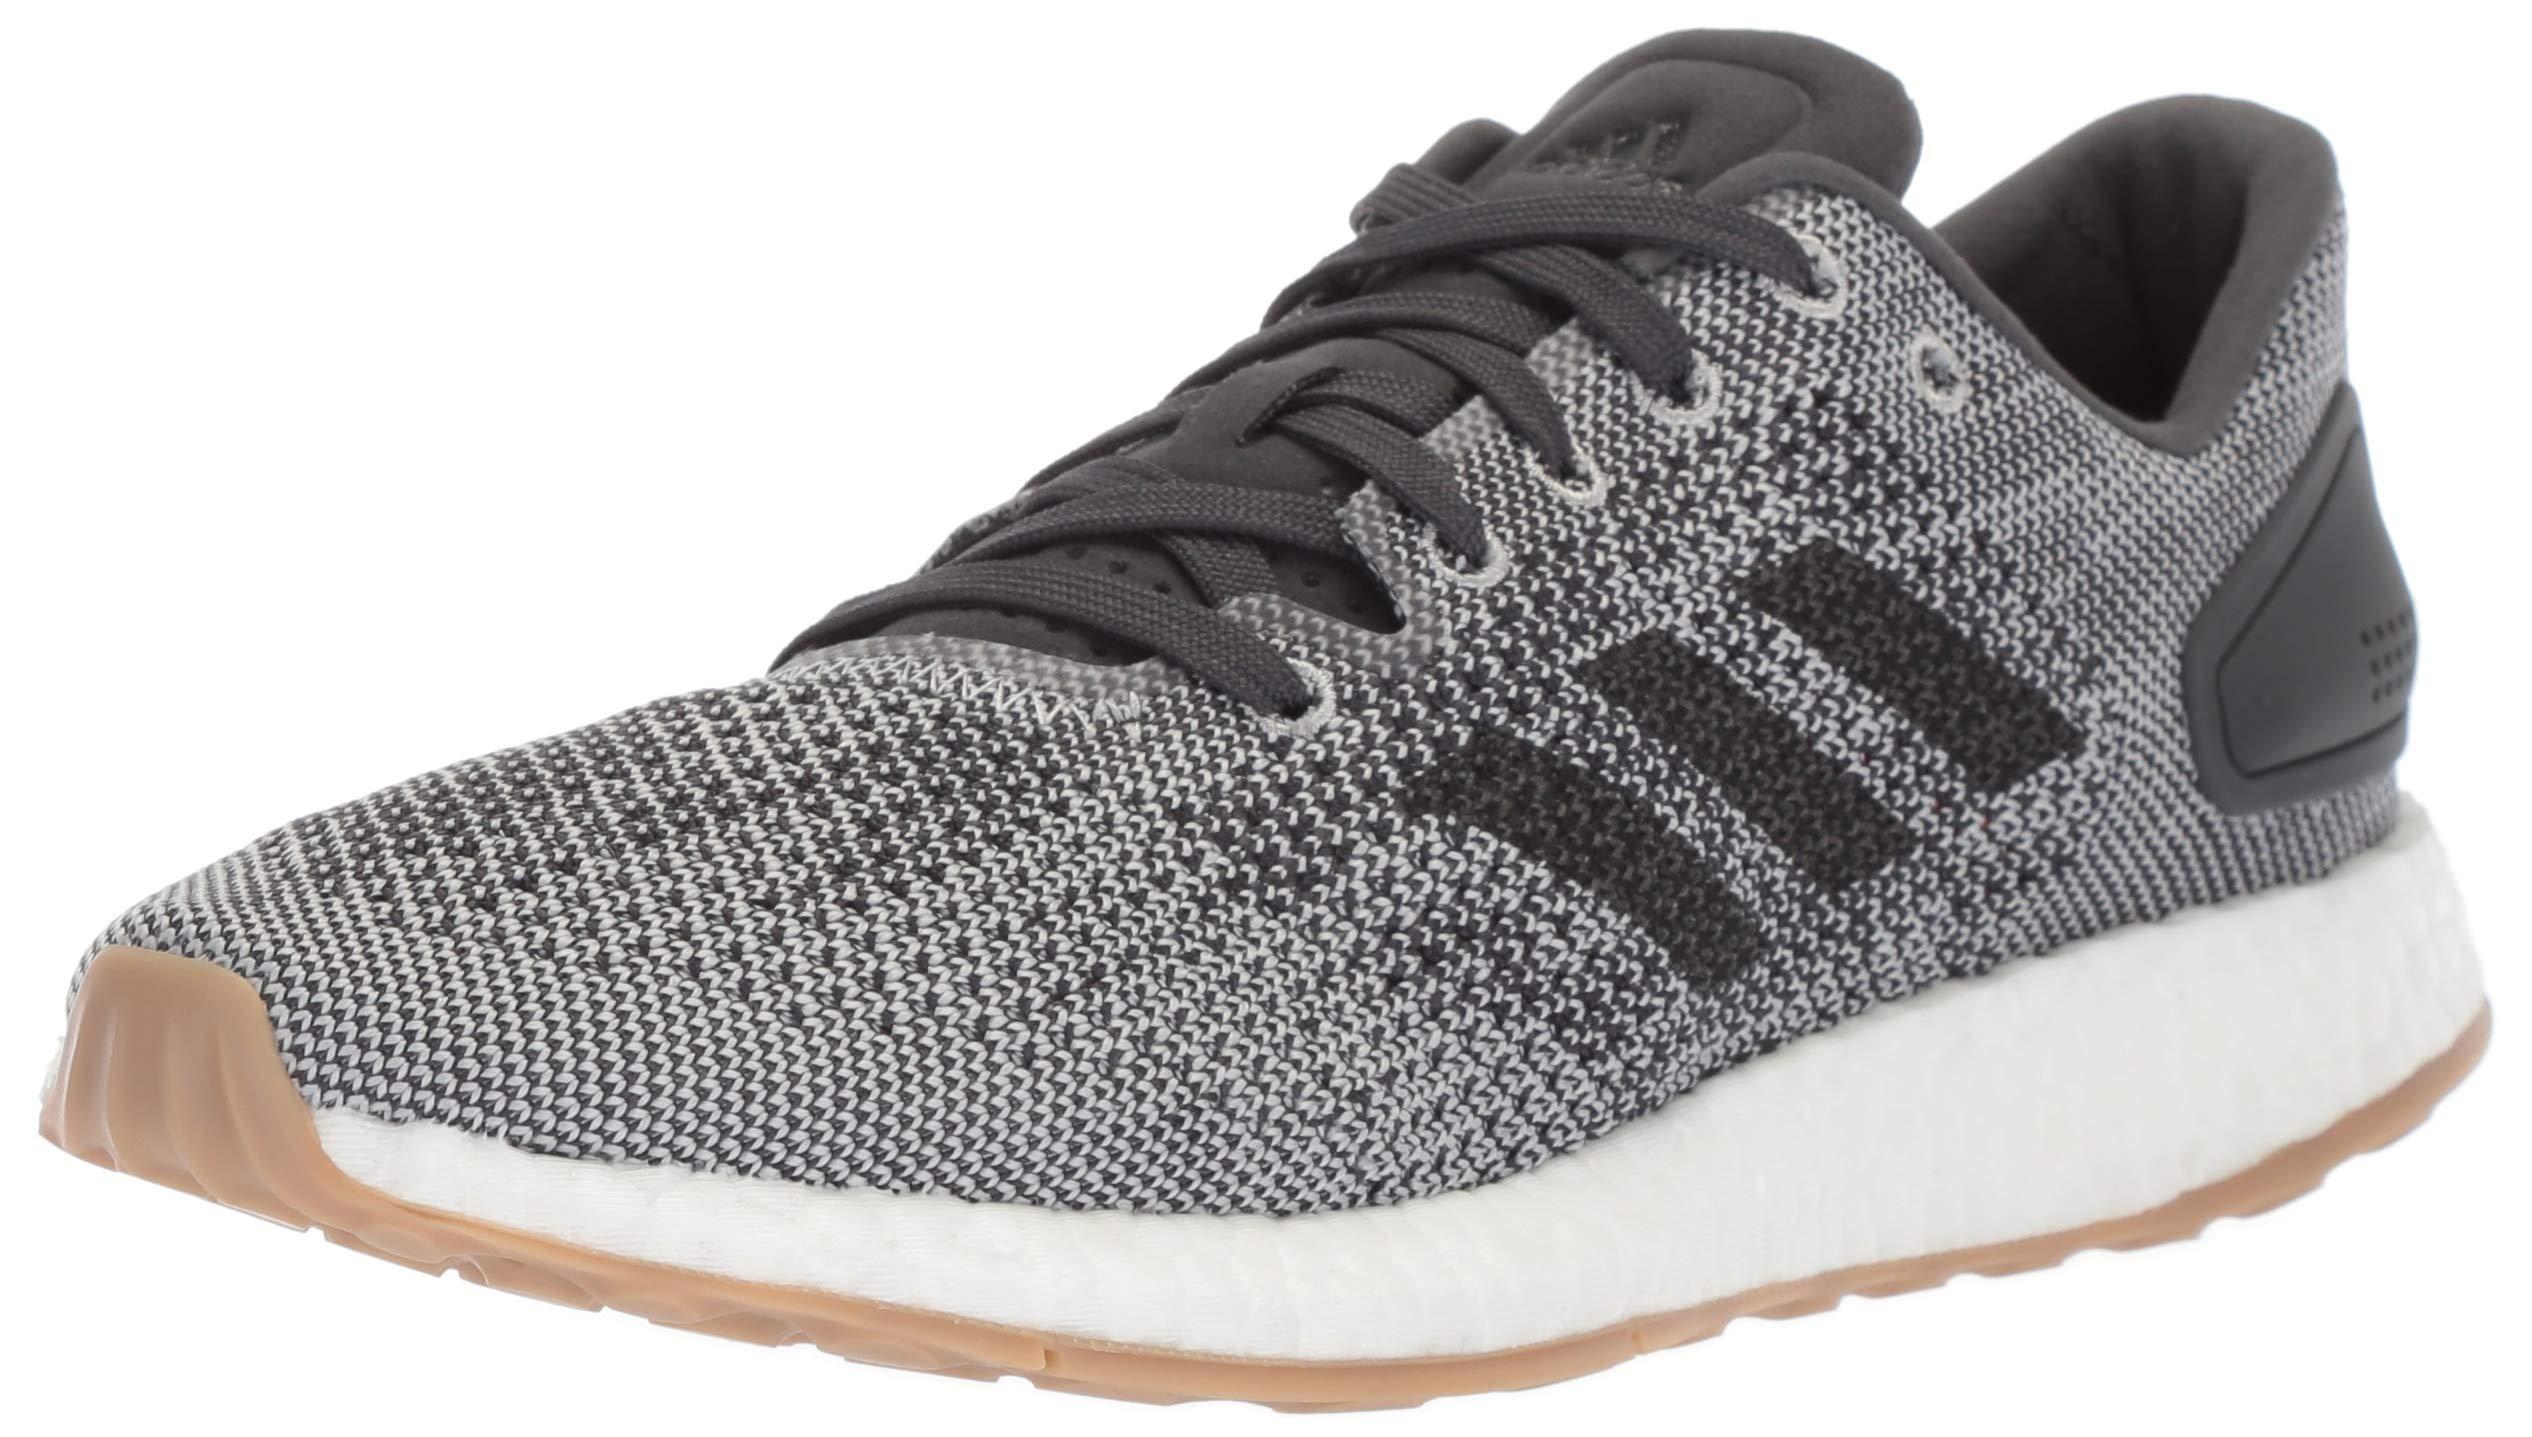 f6c5b61c67160 Galleon - Adidas Men s Pureboost DPR Running Shoe (9 M US